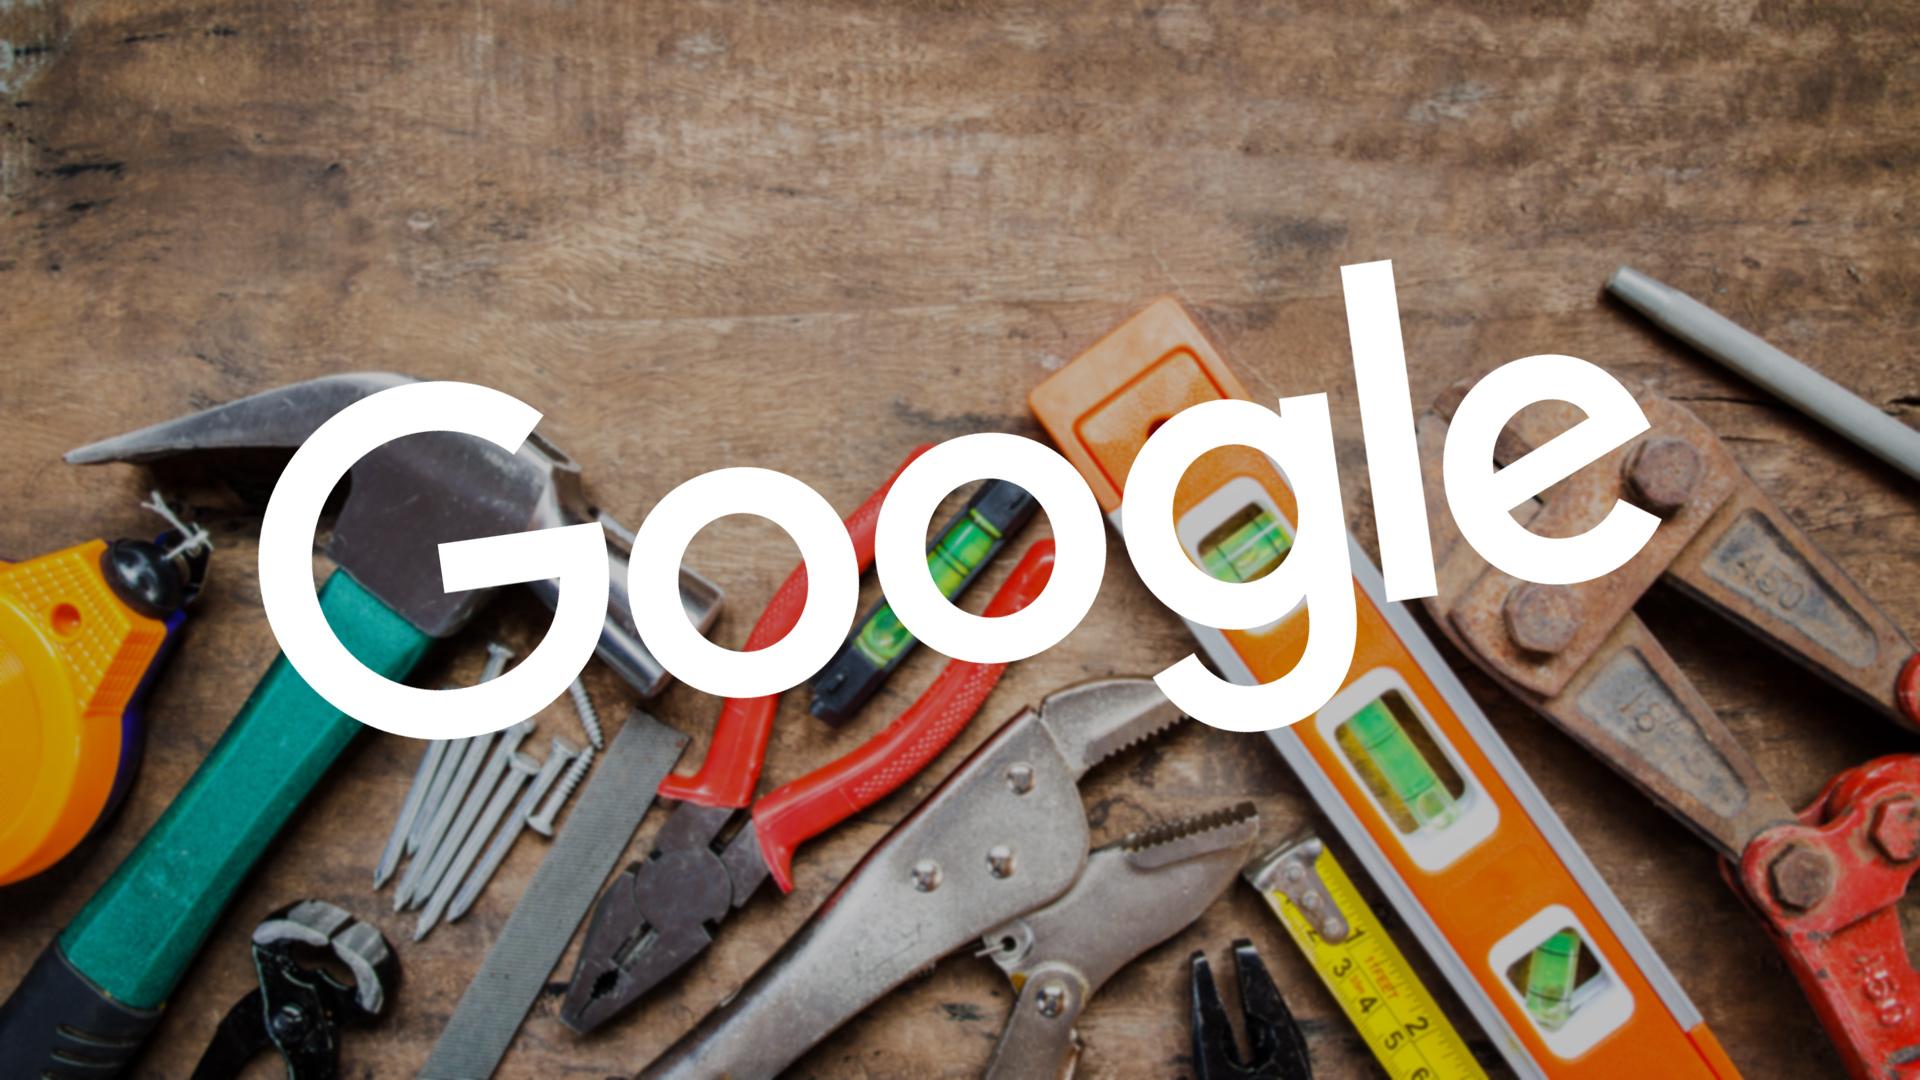 google-tools1-ss-1920